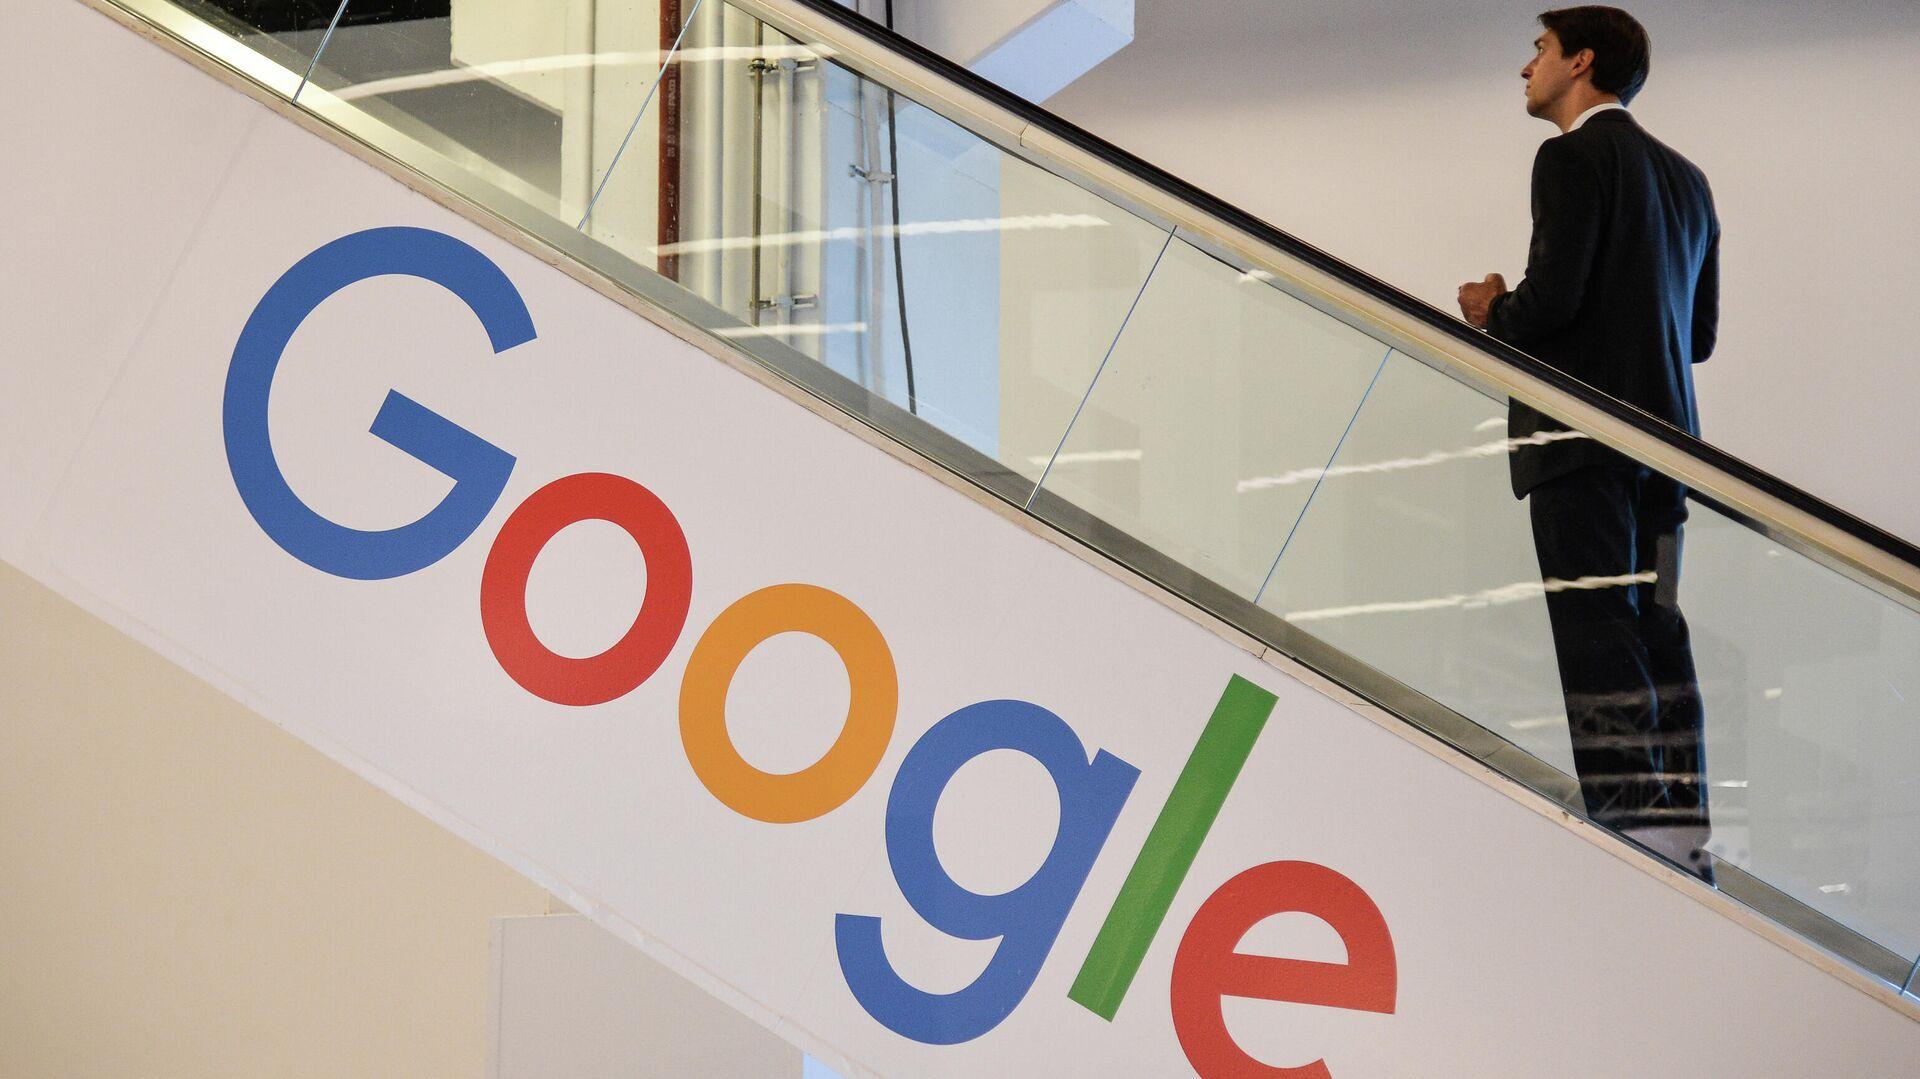 Логотип Google - РИА Новости, 1920, 29.07.2021